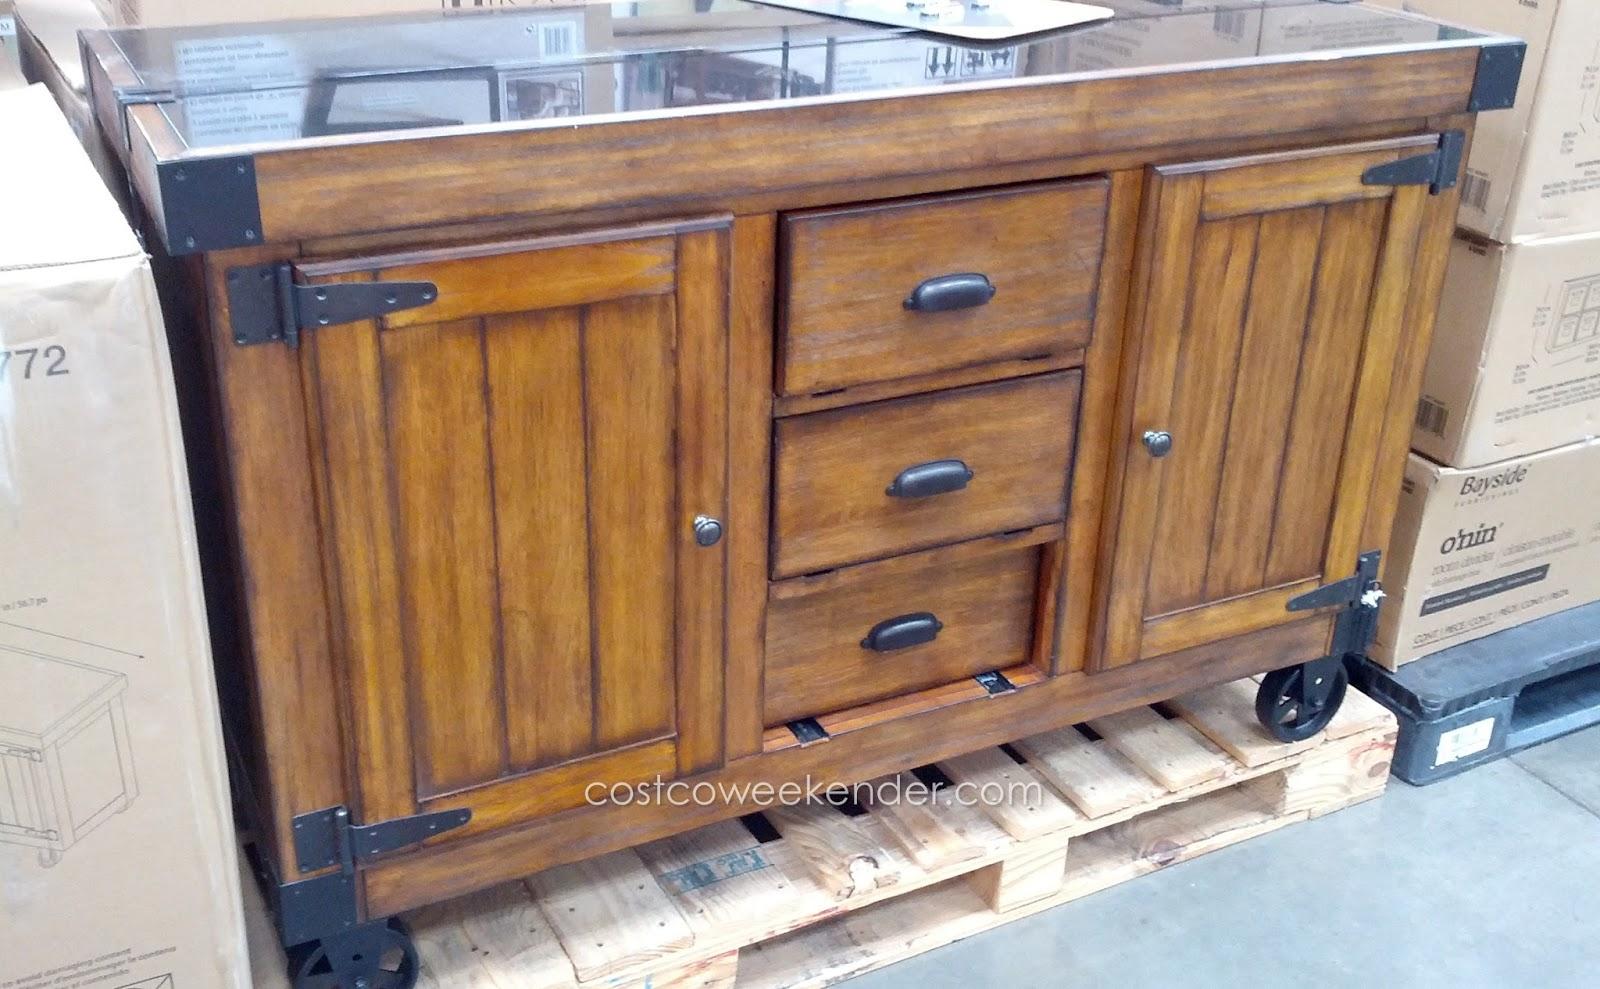 Regal Living regal living whitman kitchen cart | costco weekender